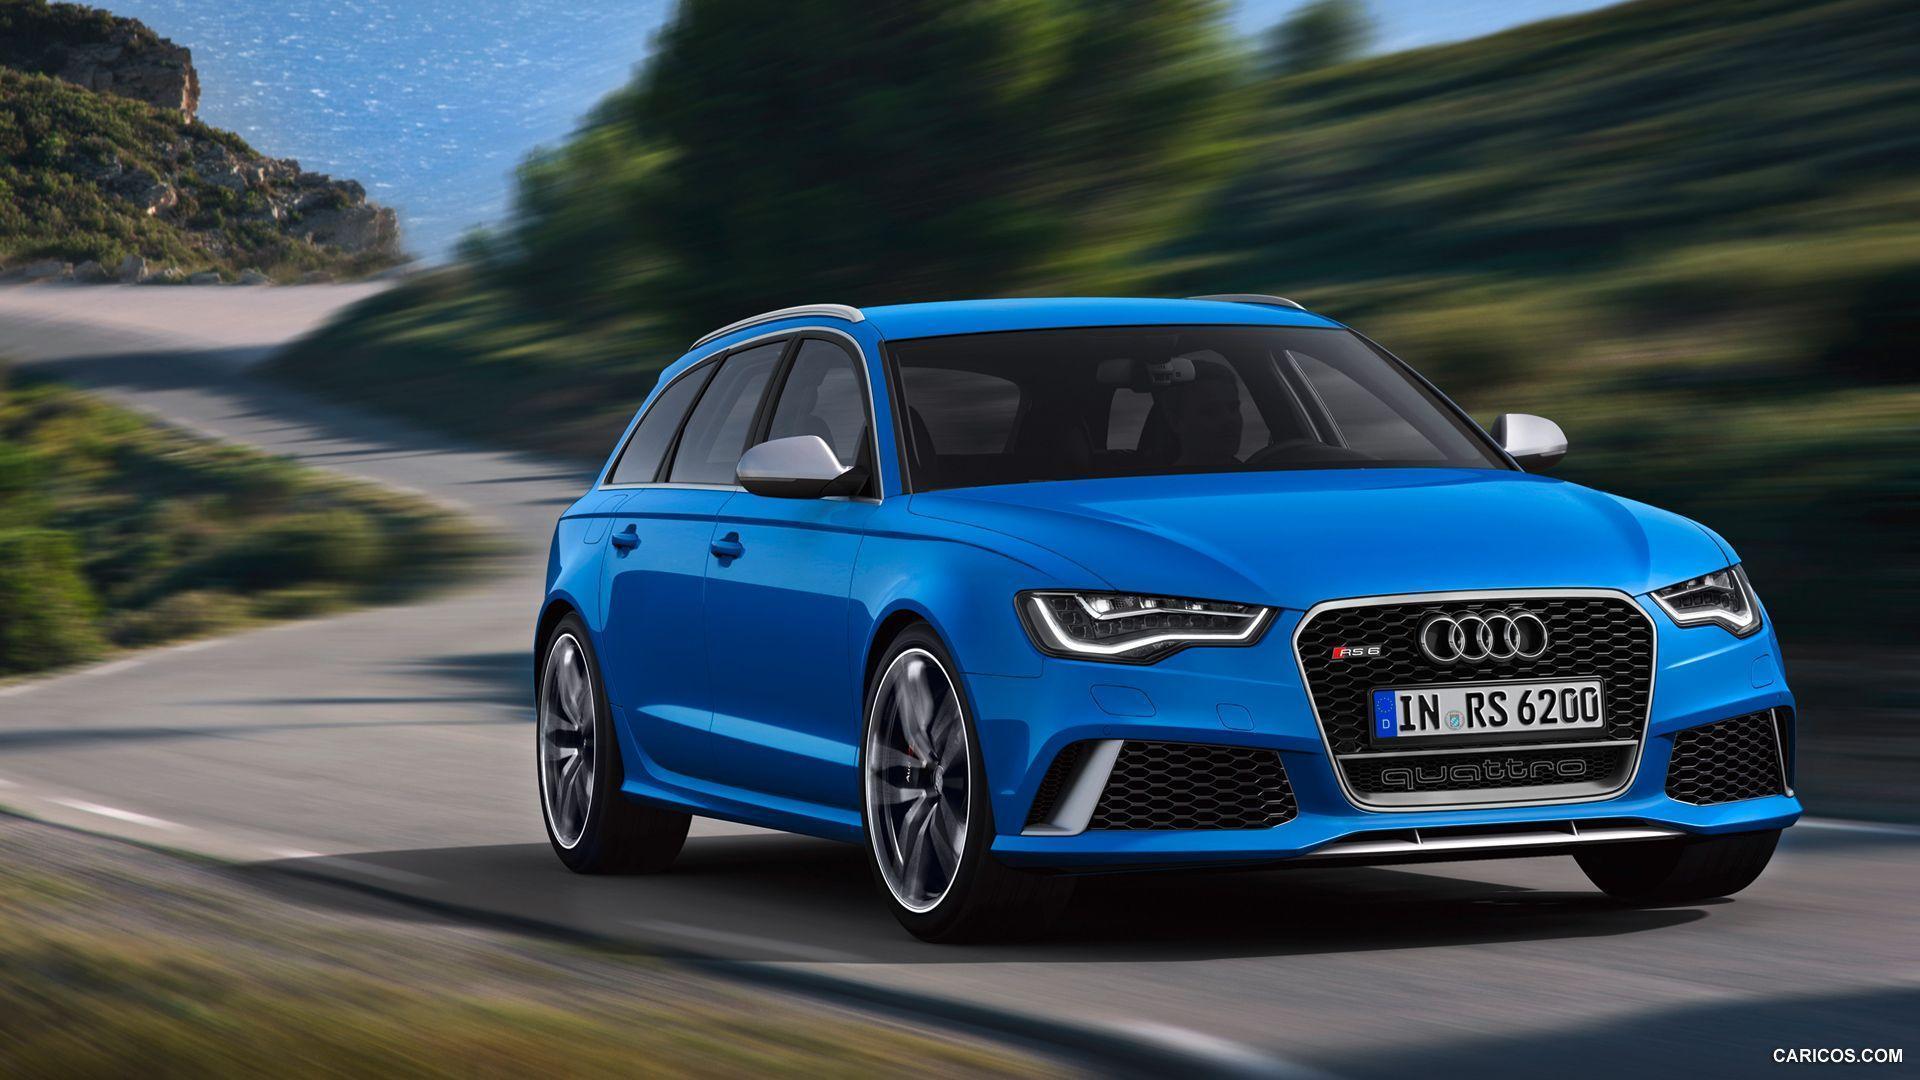 Audi RS6 Blue - wallpaper.